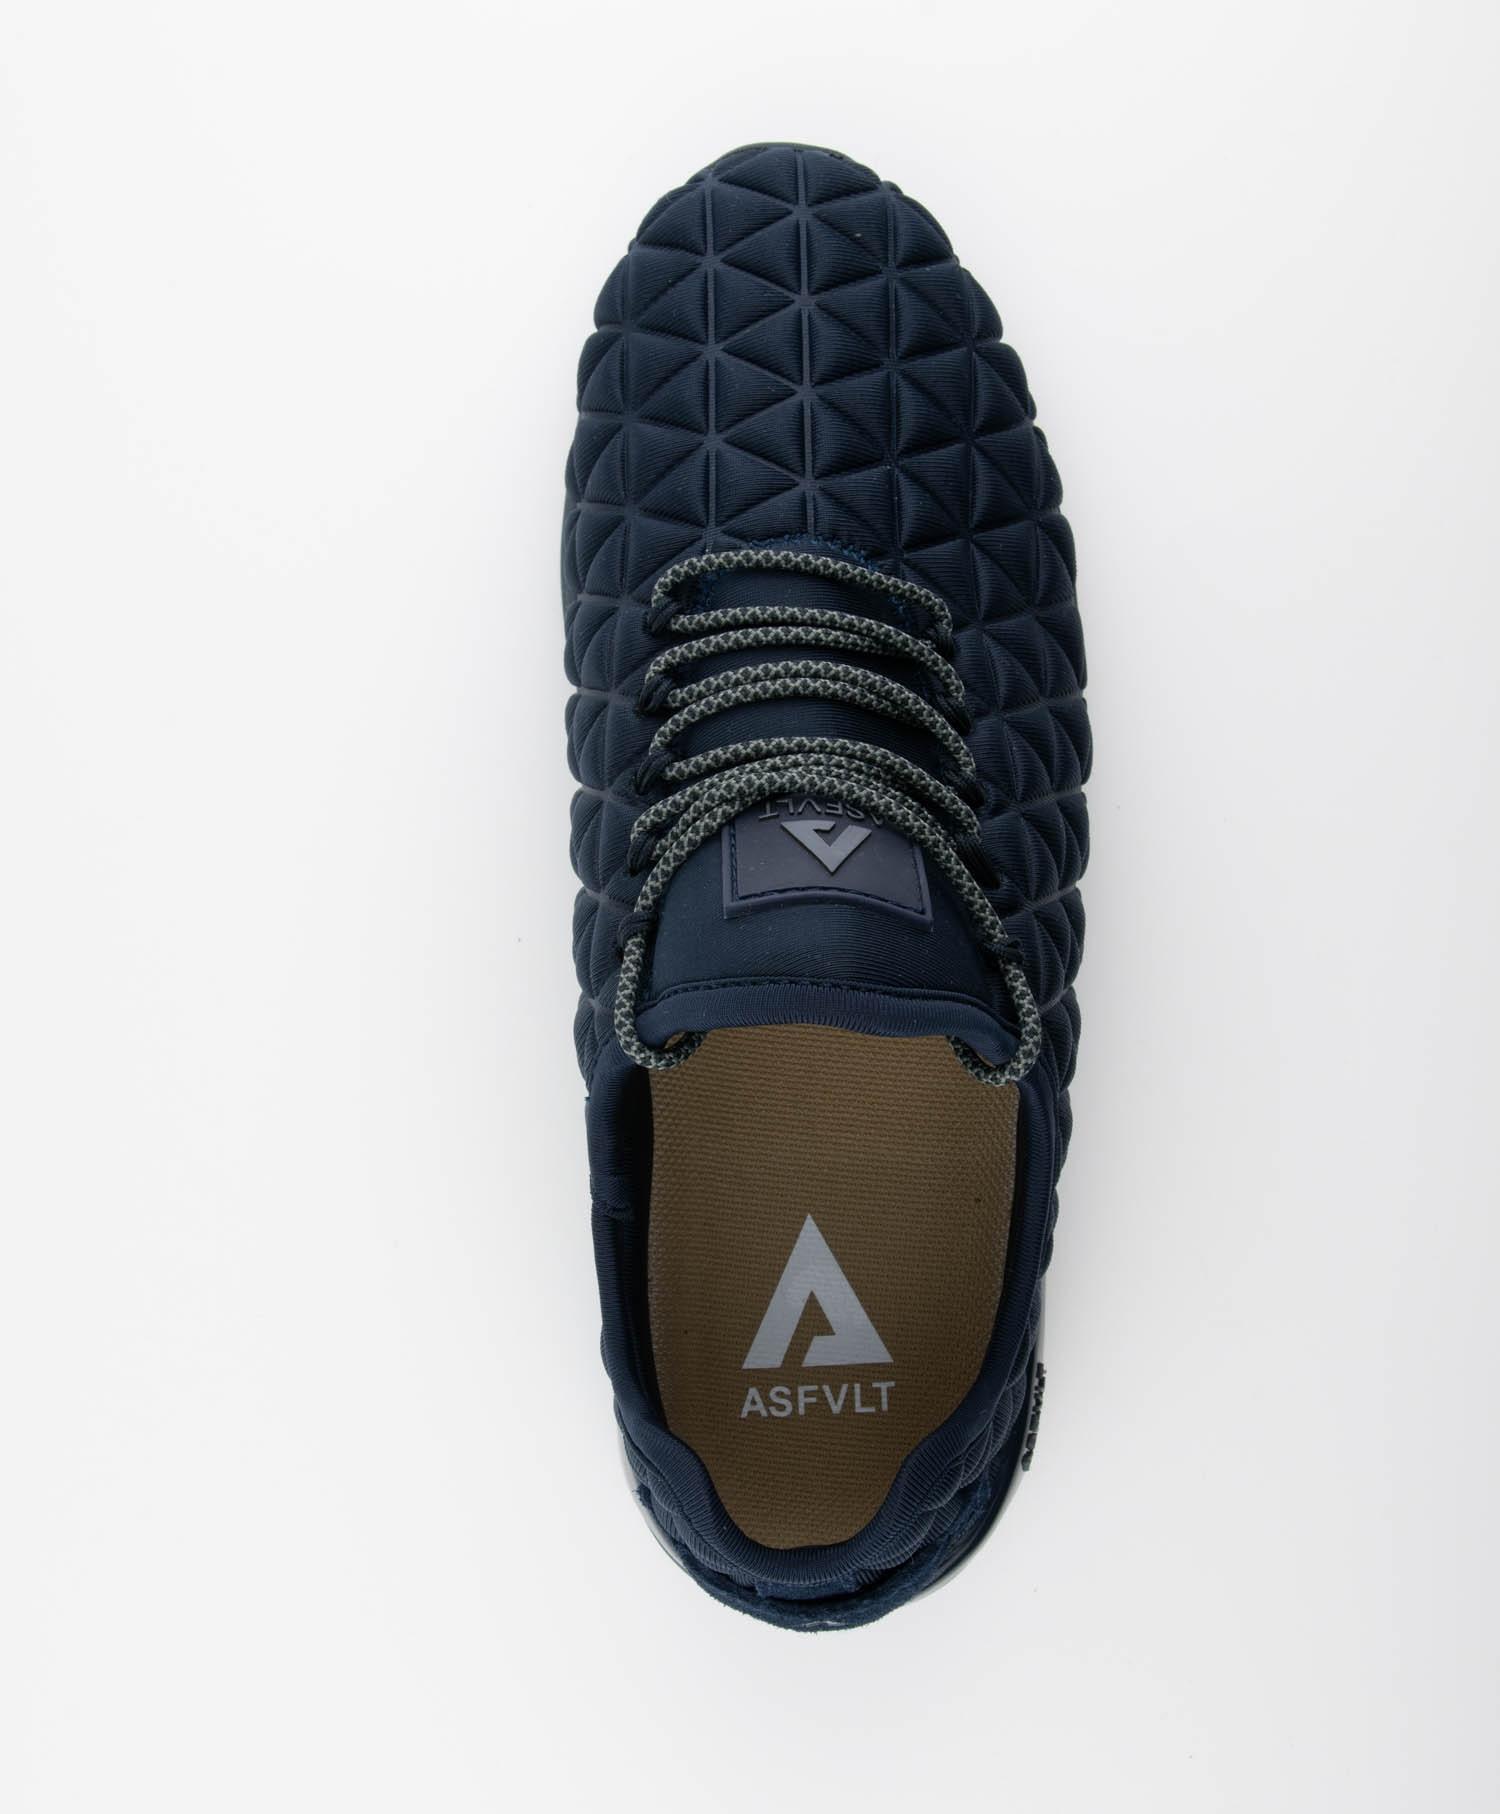 ASFVLT Speed Sock Neo